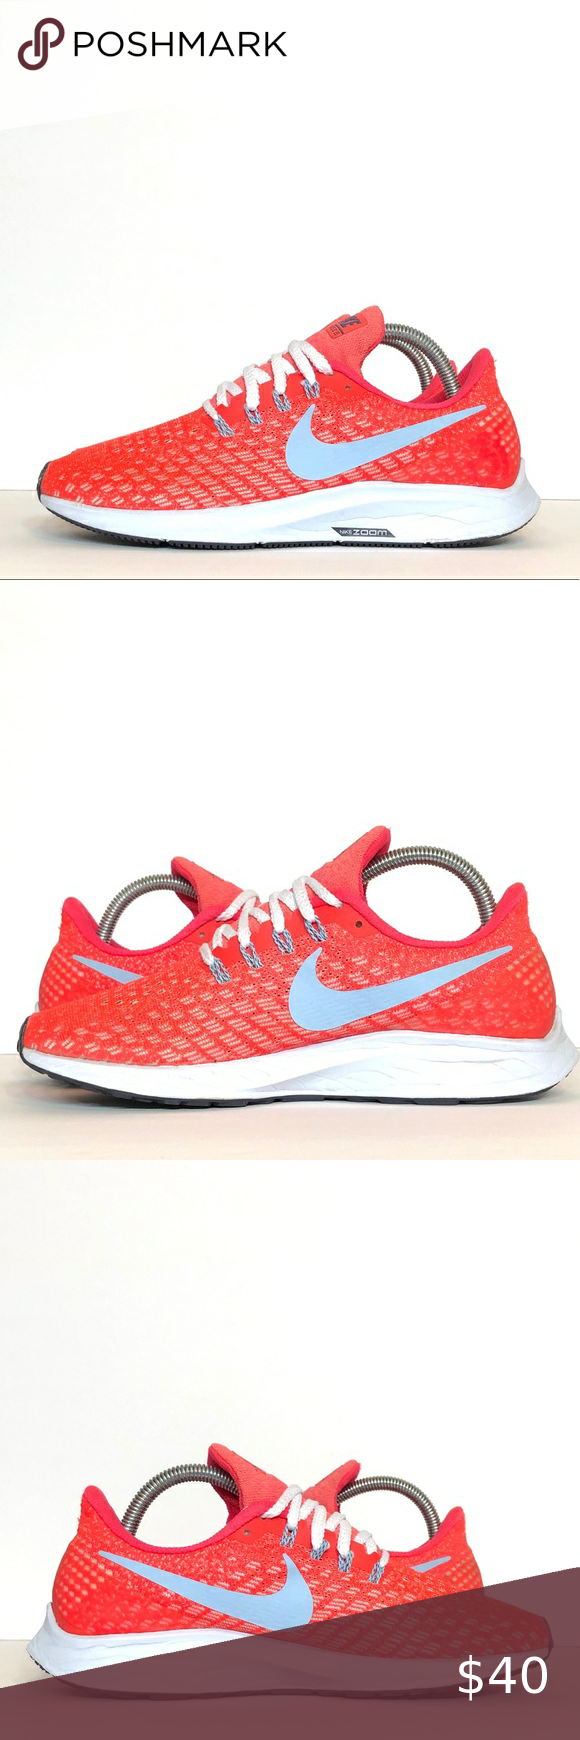 Nike Air Zoom Pegasus 35 women's size 8